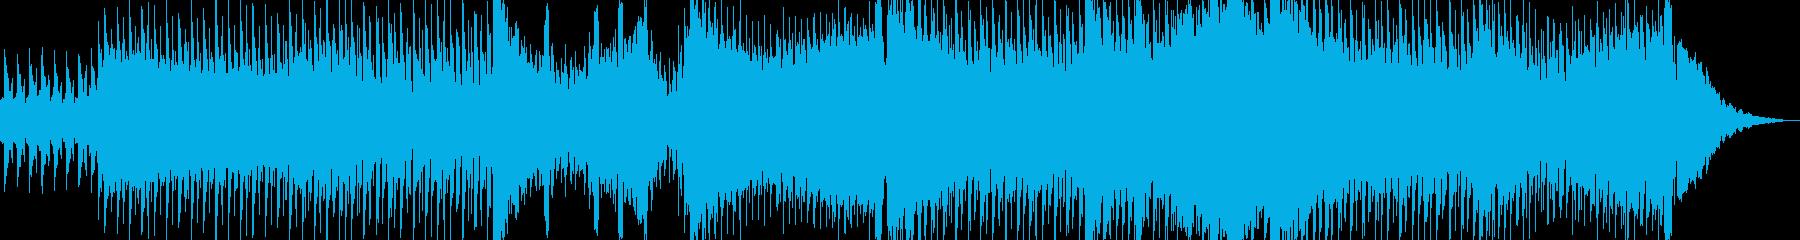 【CM】メランコリーなメロディが印象的の再生済みの波形